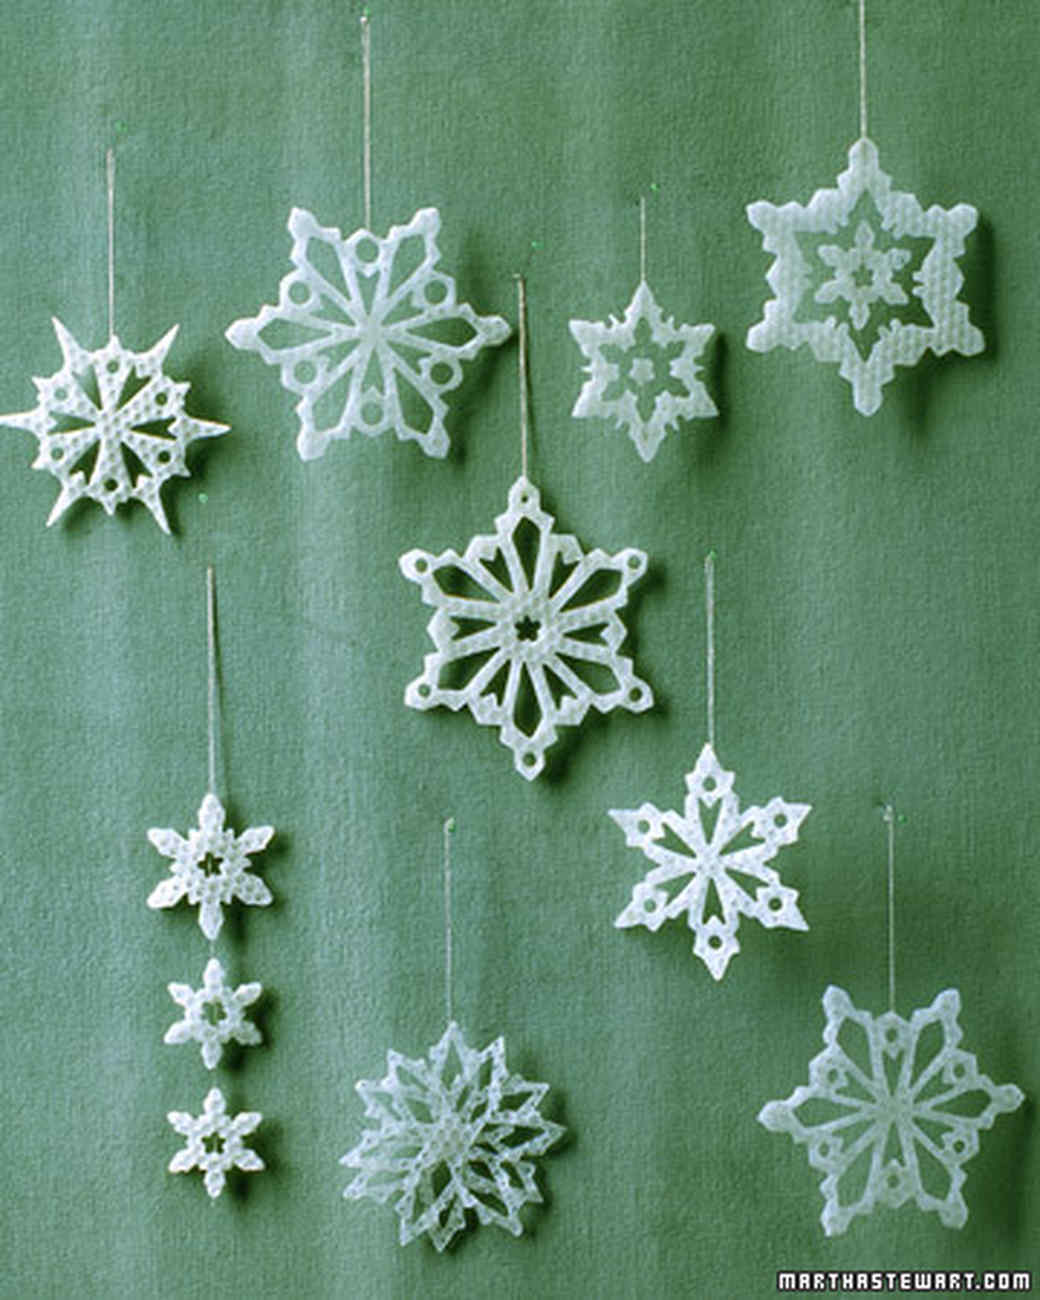 Wax Snowflakes